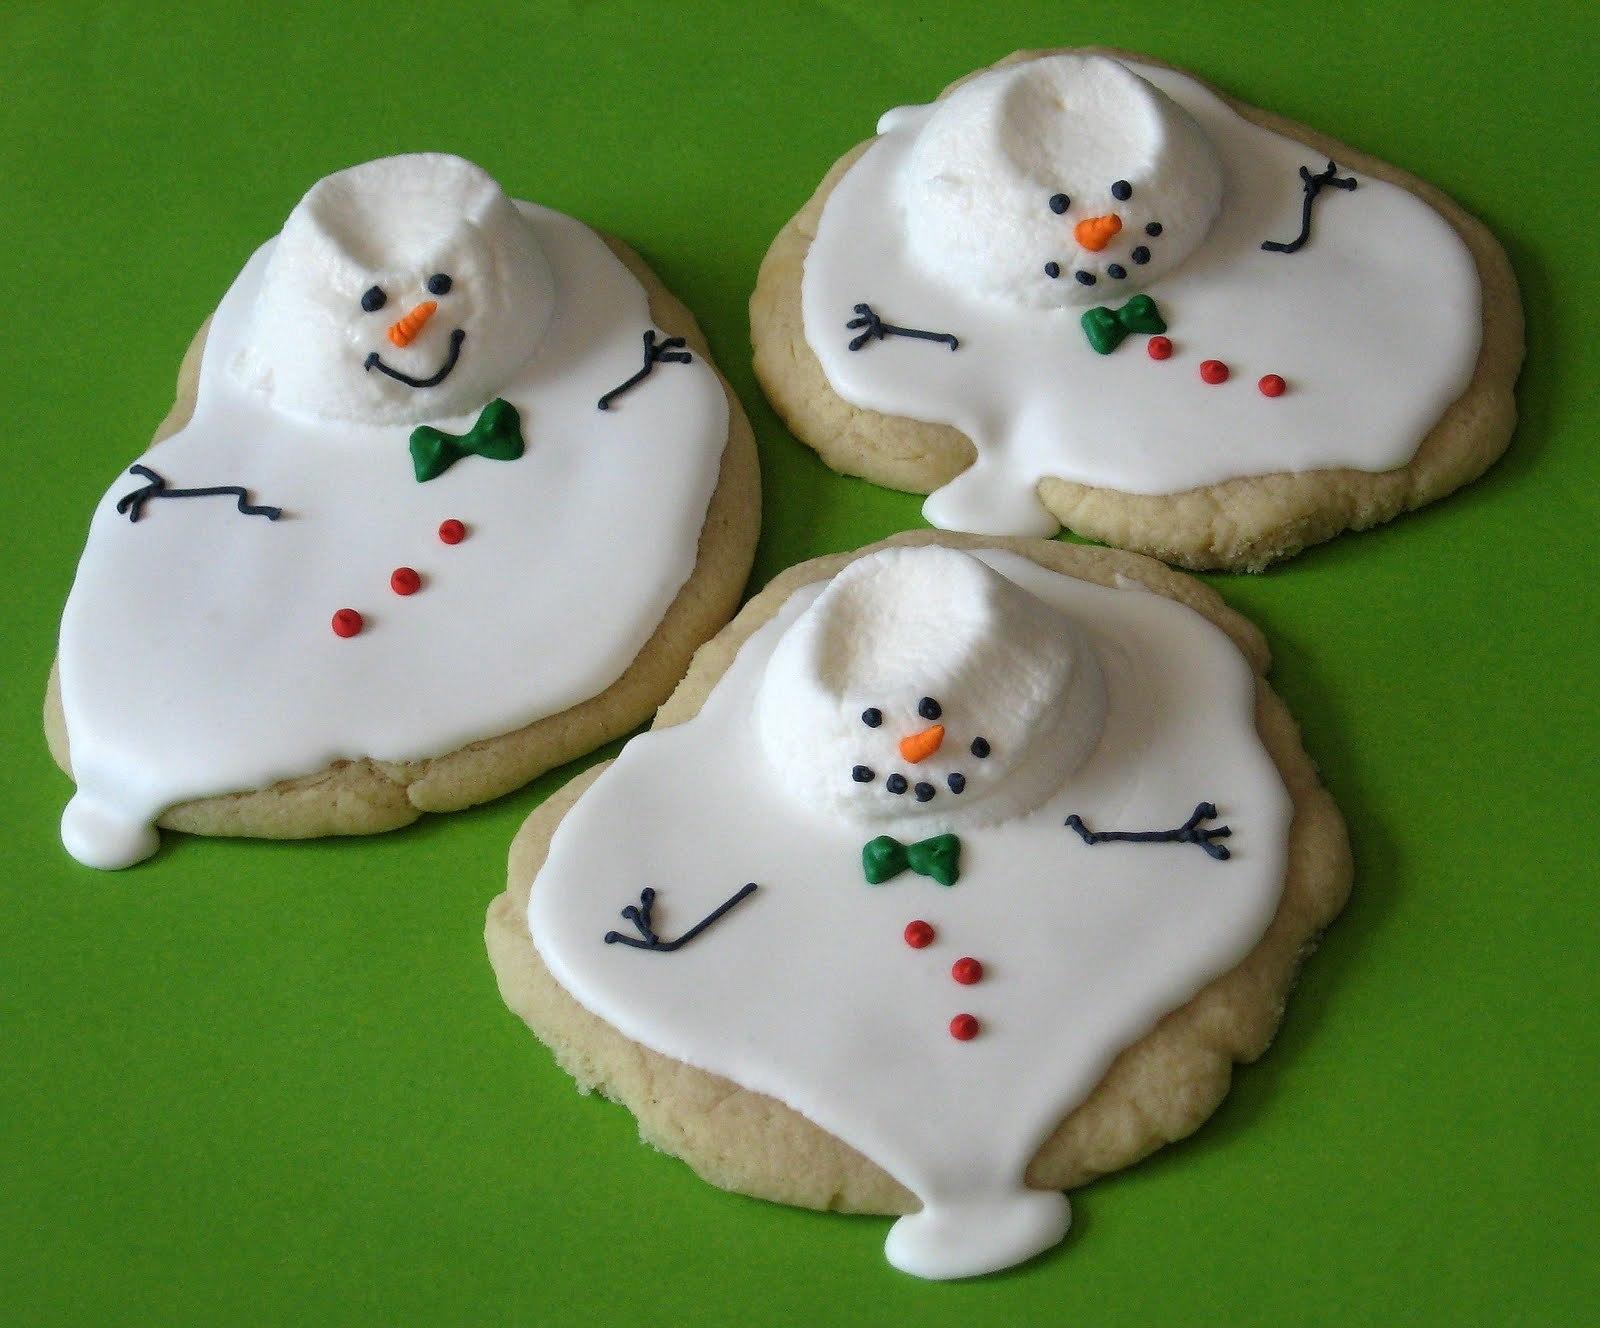 df947486940664c2d101_melted_snowman_cookies.jpg